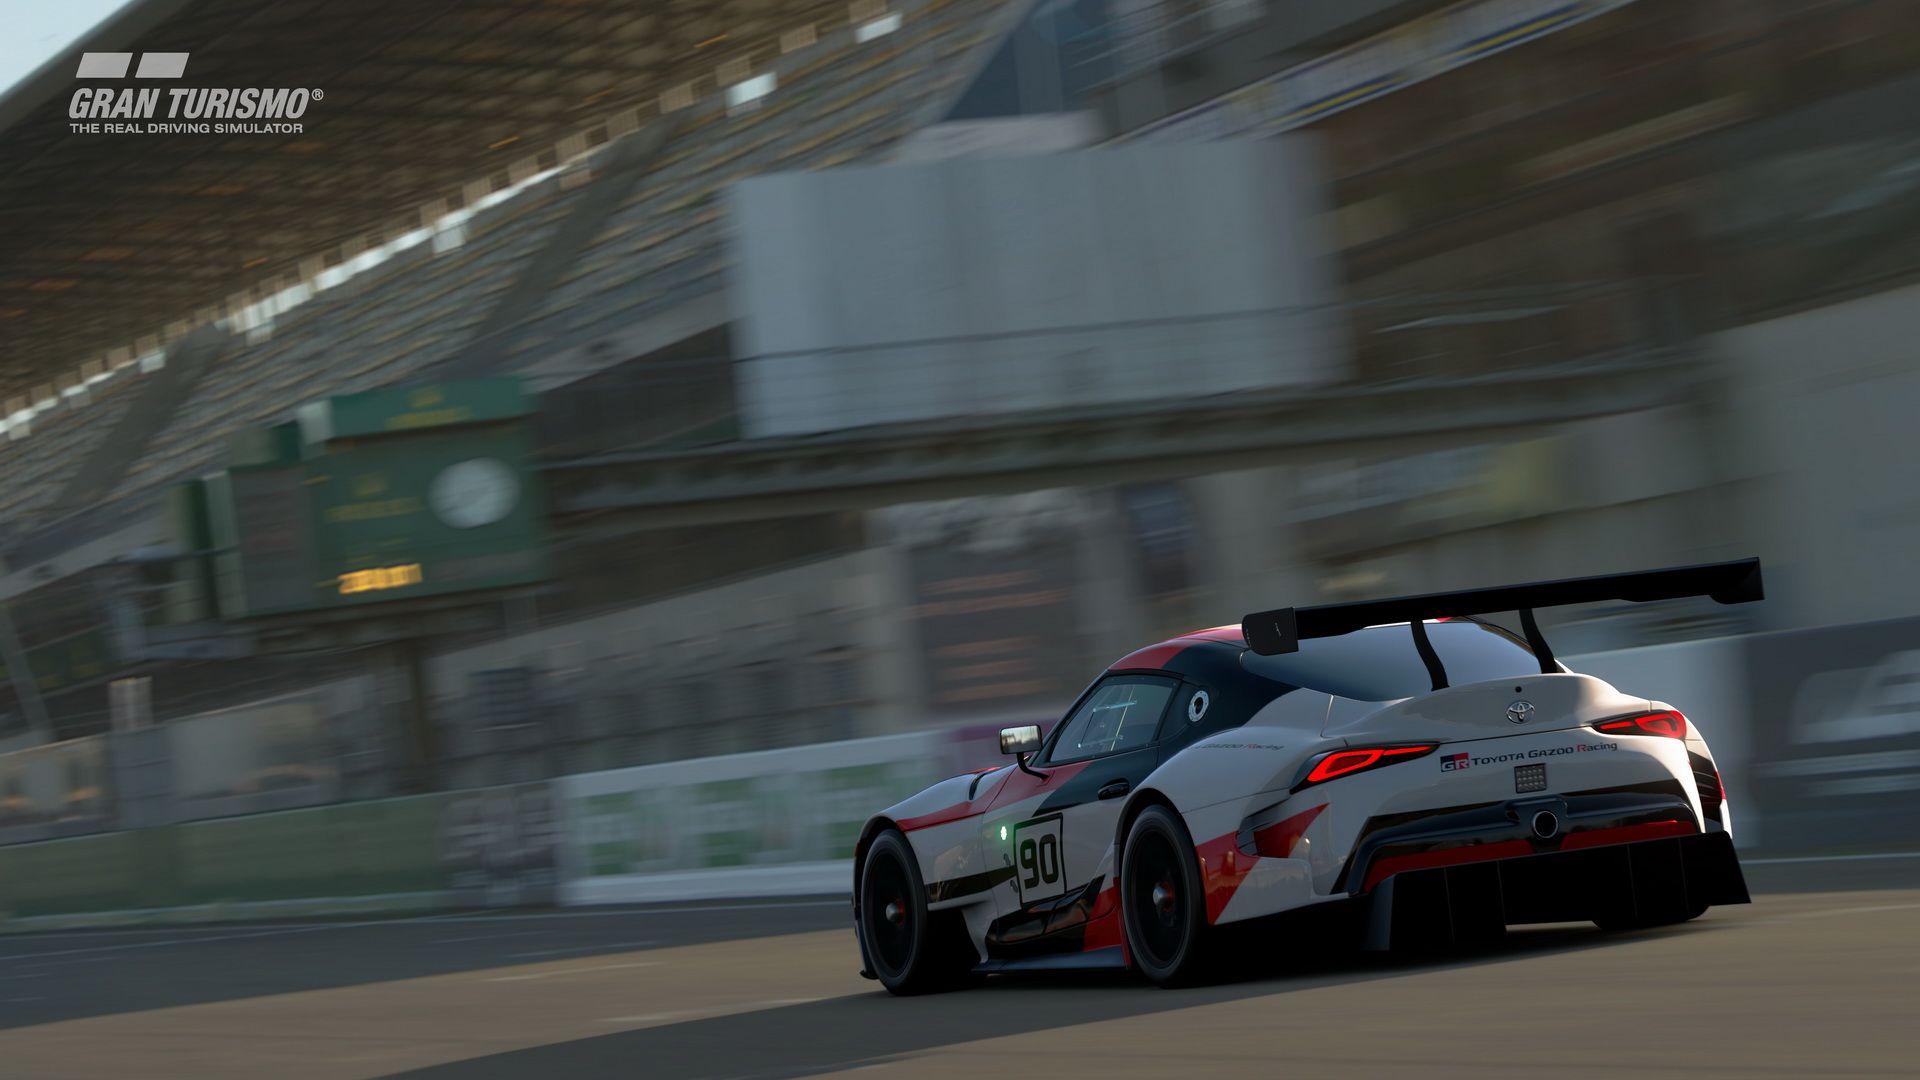 2018 Toyota Gr Supra Racing Concept Gran Turismo Sport 4